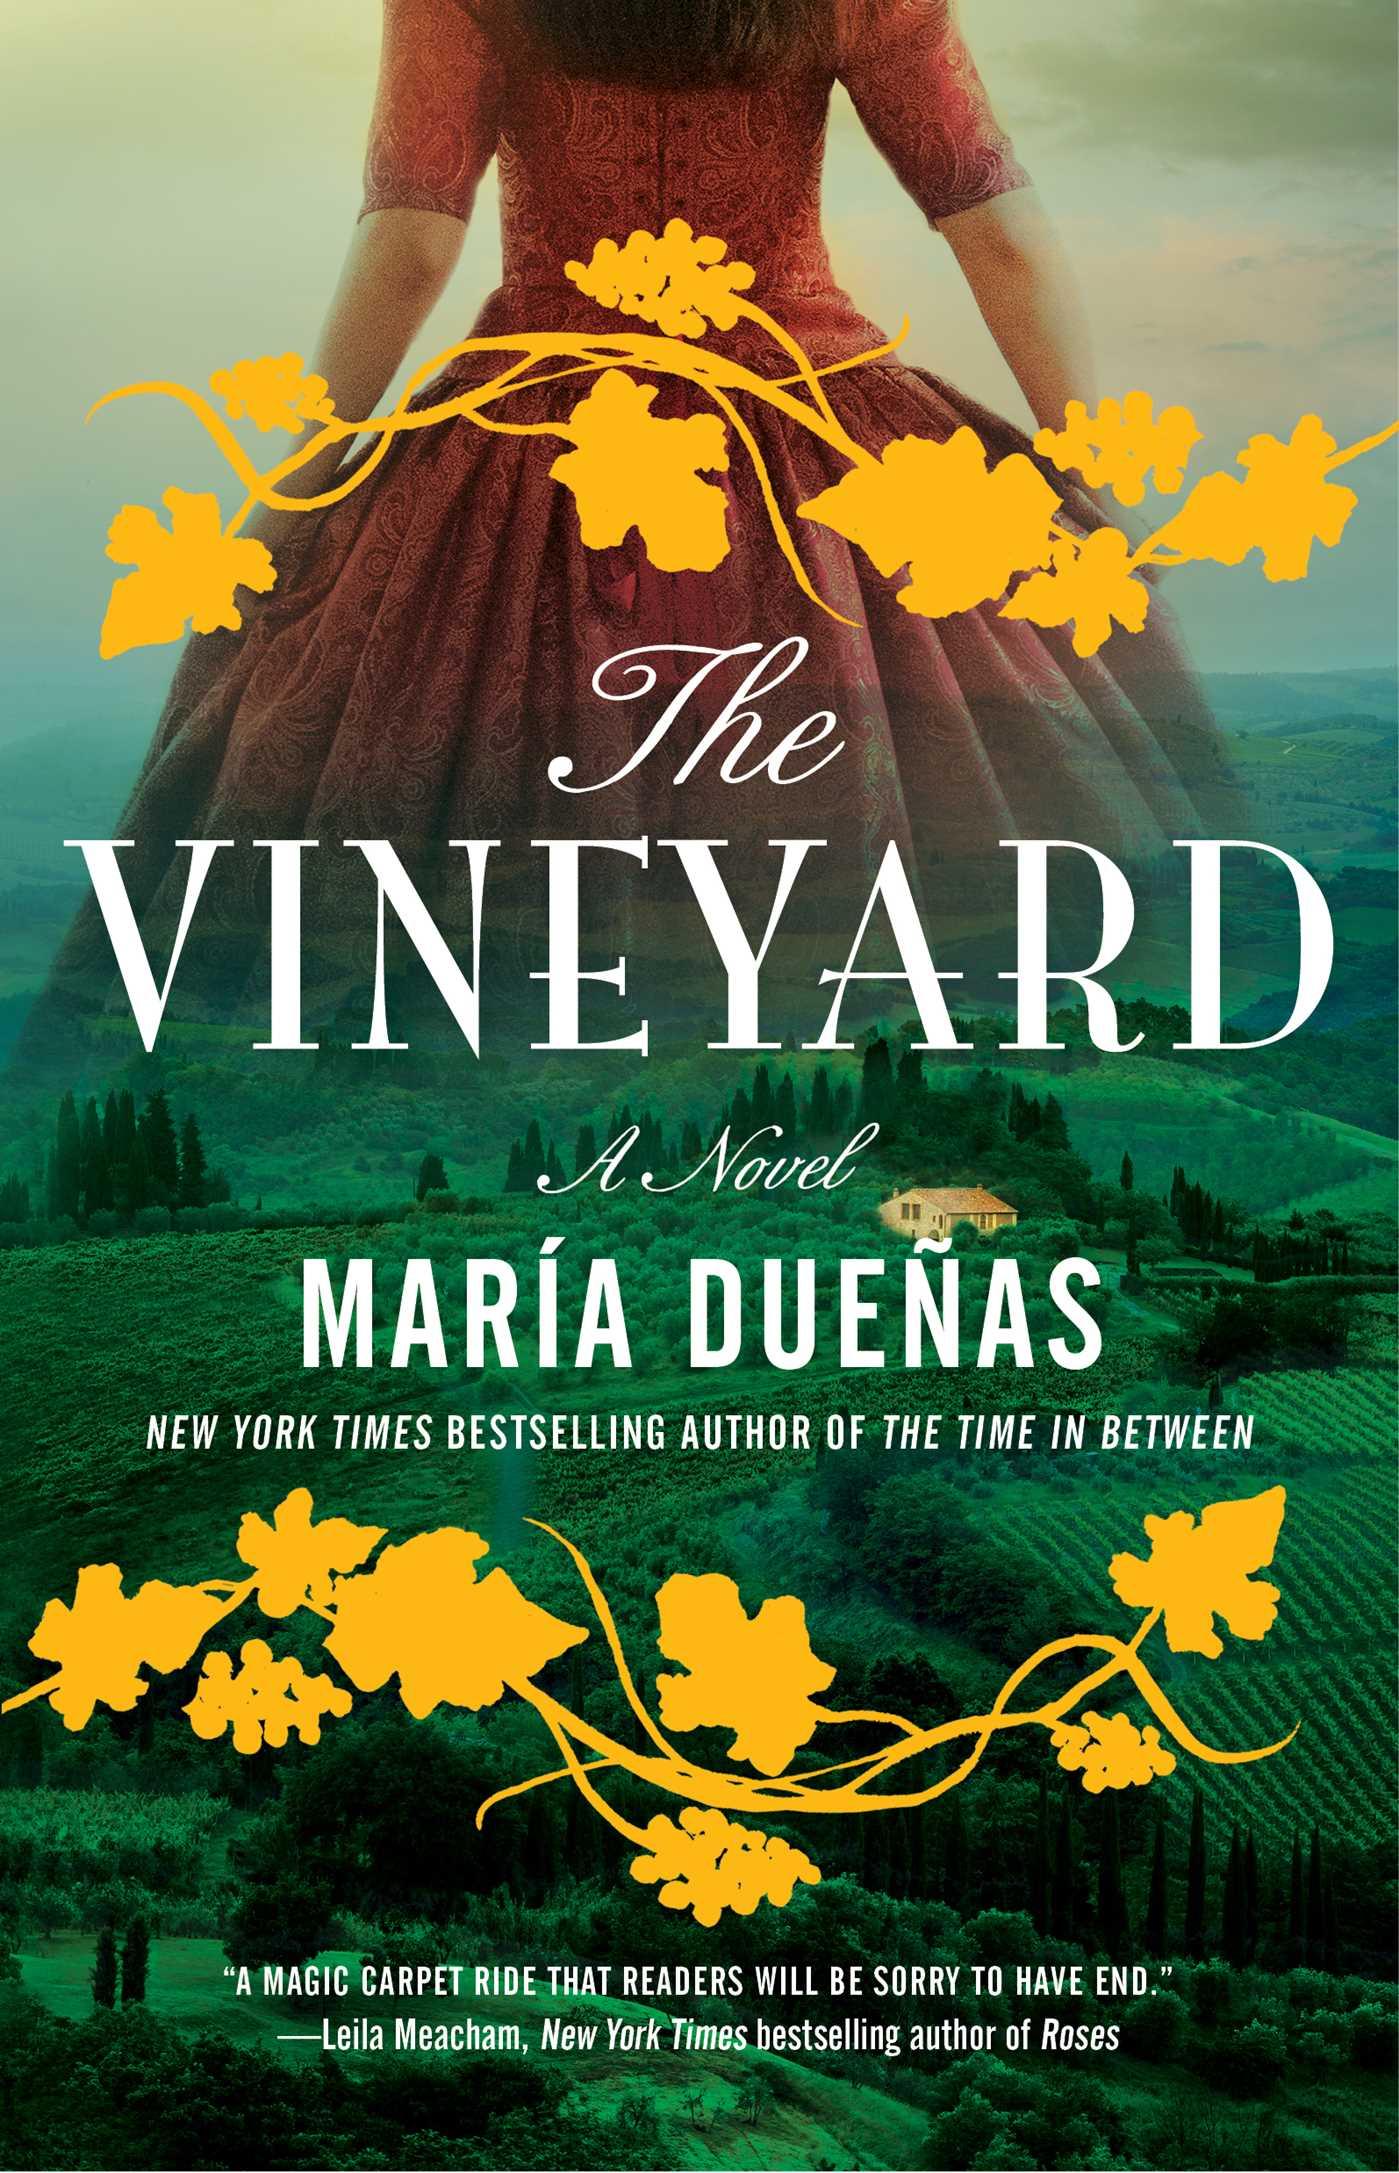 The vineyard 9781501124549 hr